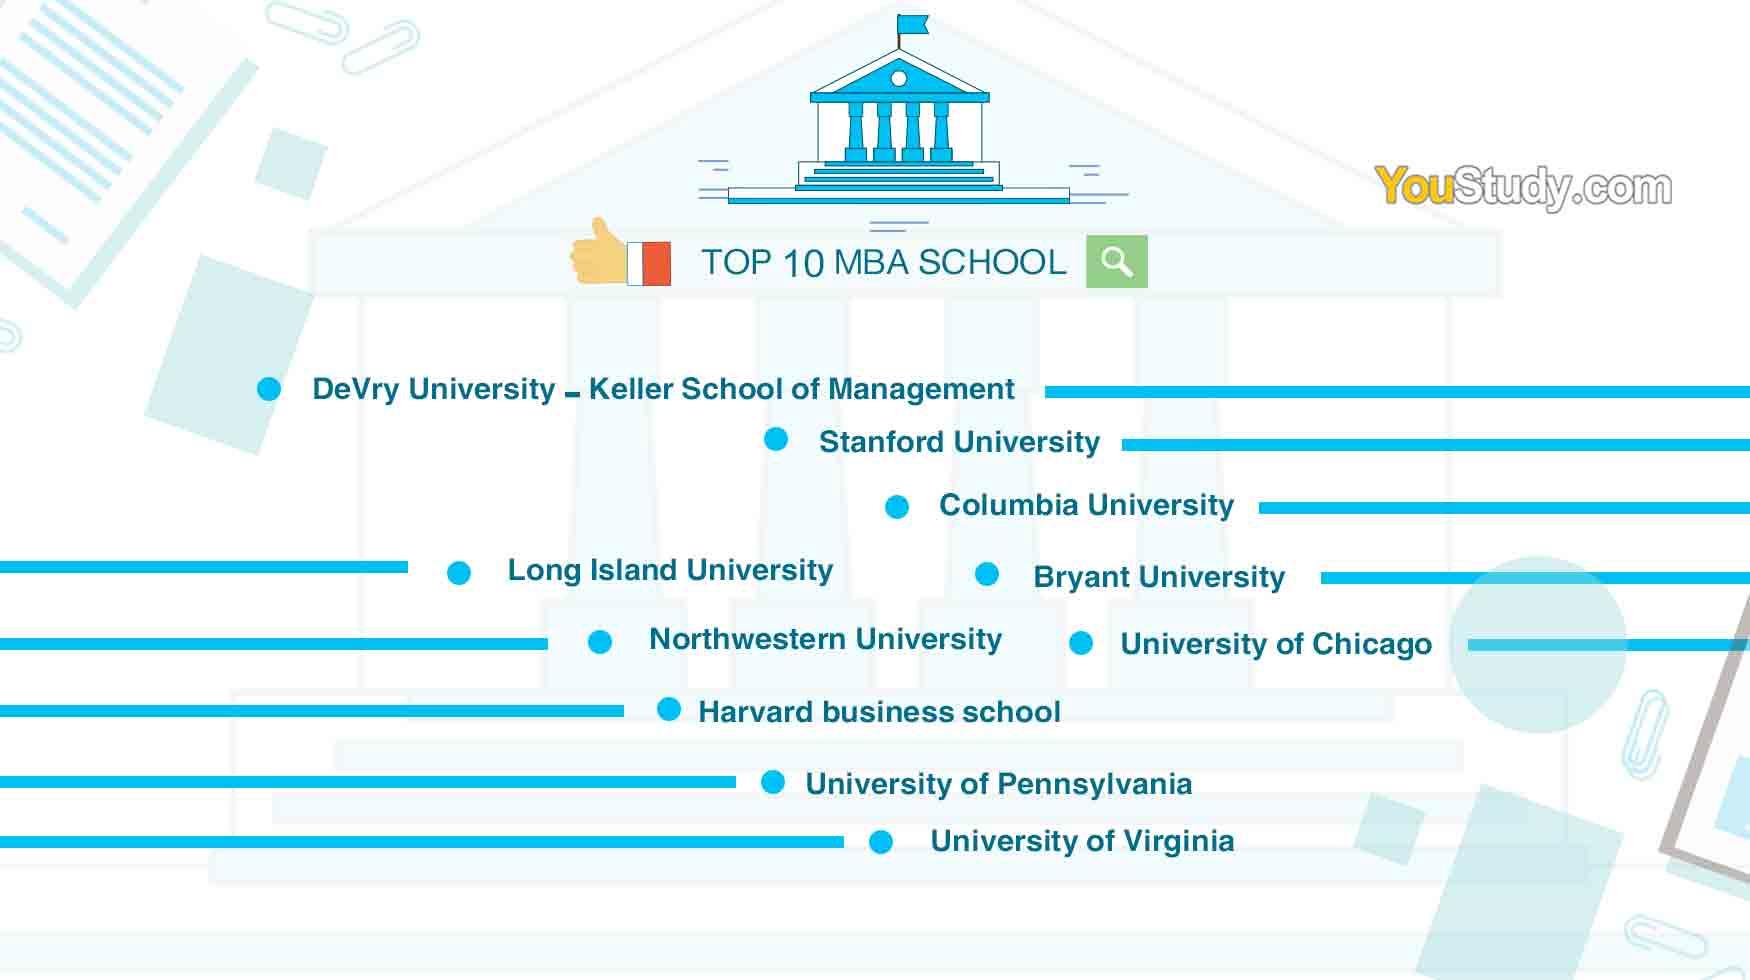 Top 10 MBA schools